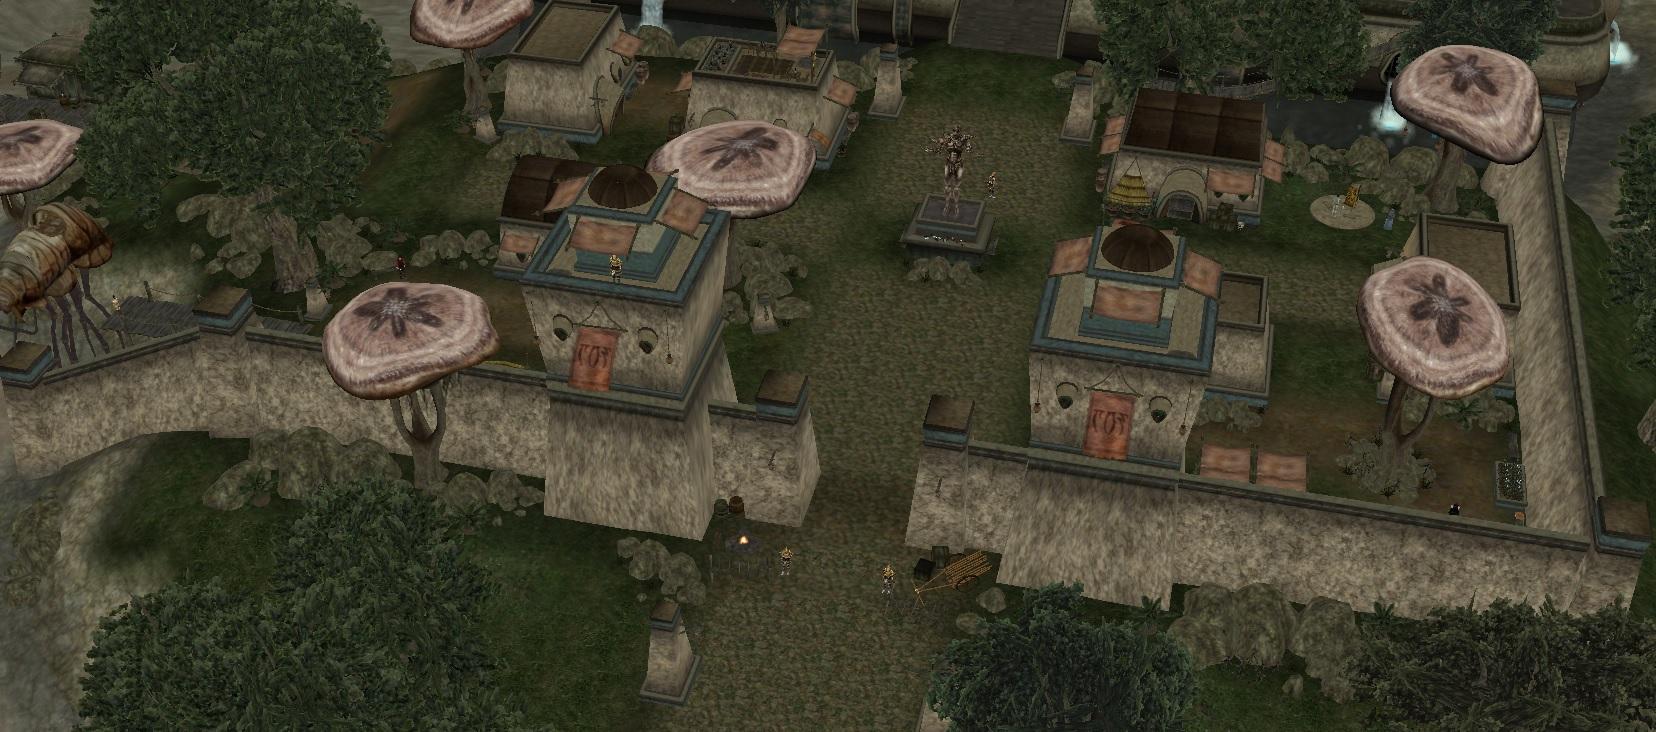 RELEASE] Morrowind Rebirth 4 0 news - Mod DB